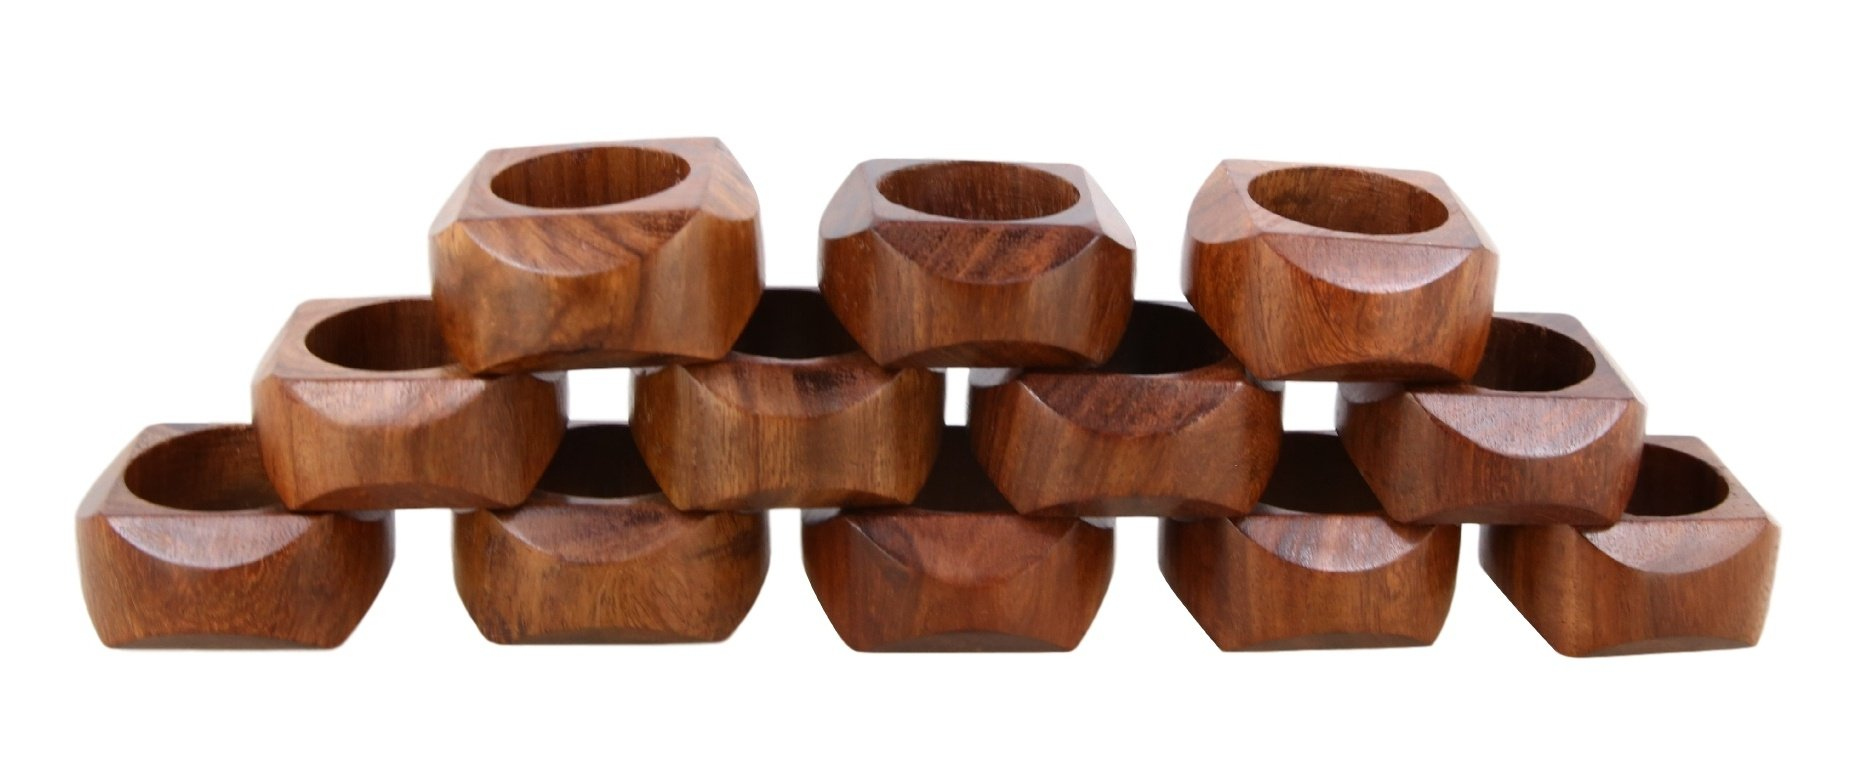 Shalinindia Handmade Artisan Crafted in India Wood Napkin Ring Set of 12